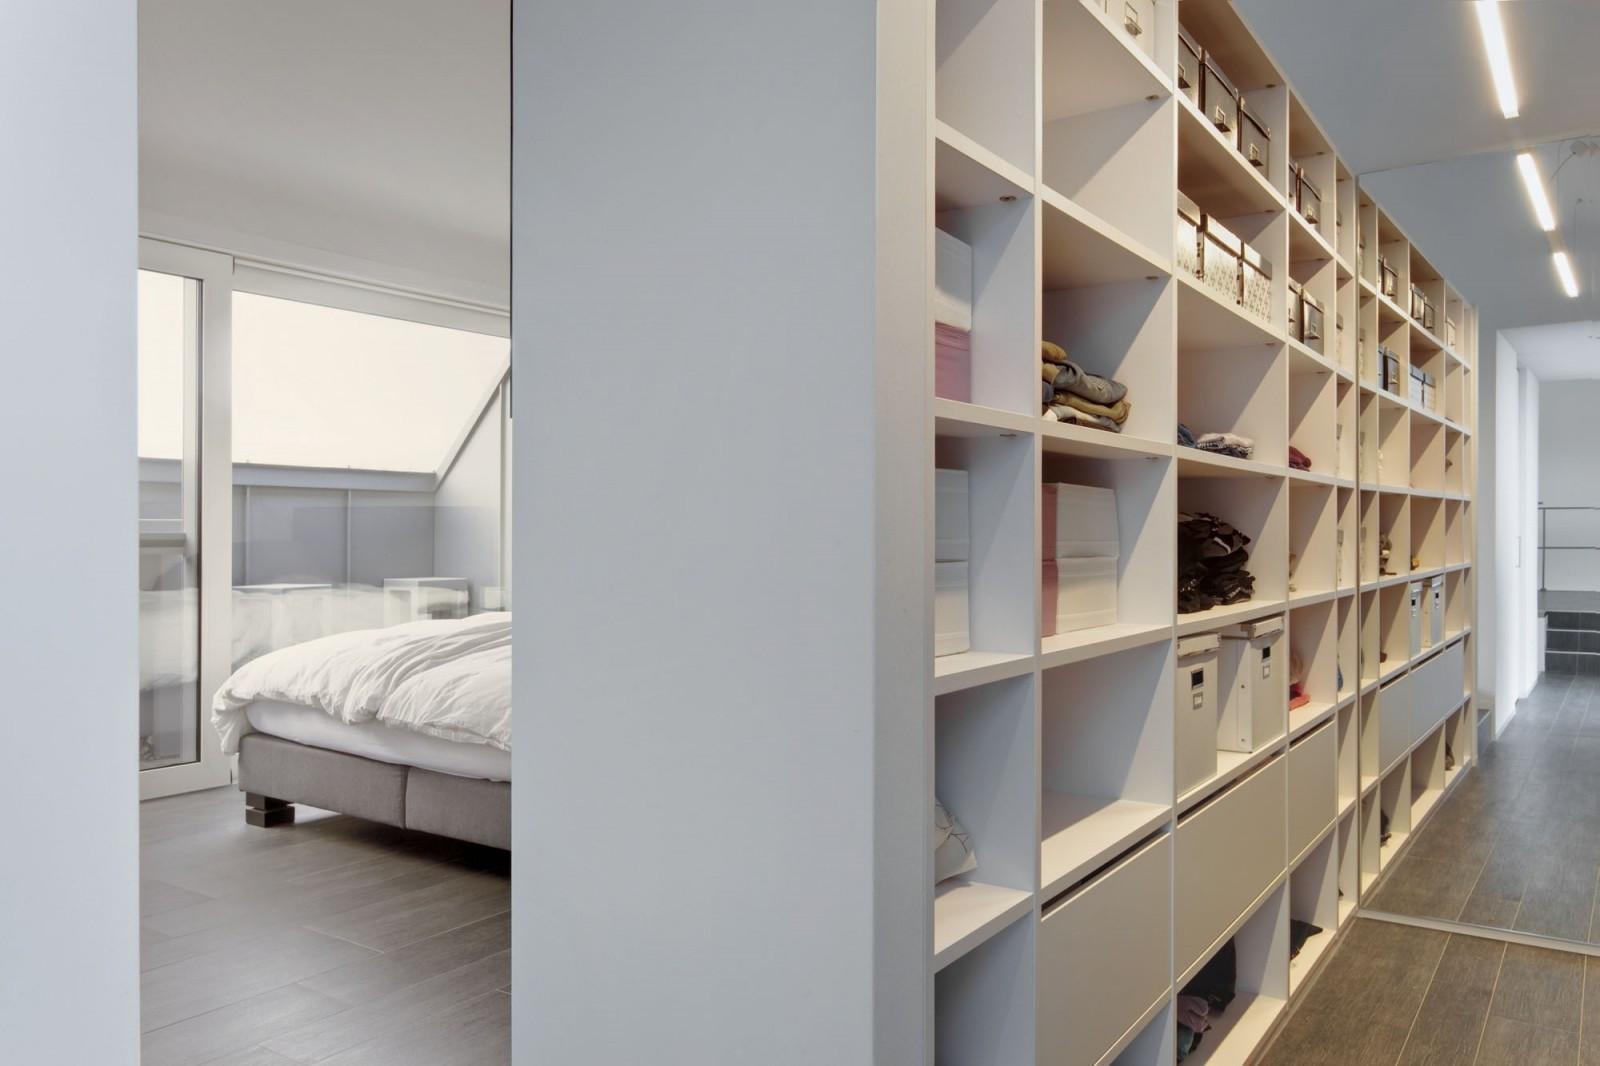 Inloopdressing naast slaapkamer › Kast-ID | Kasten, Meubelen ...